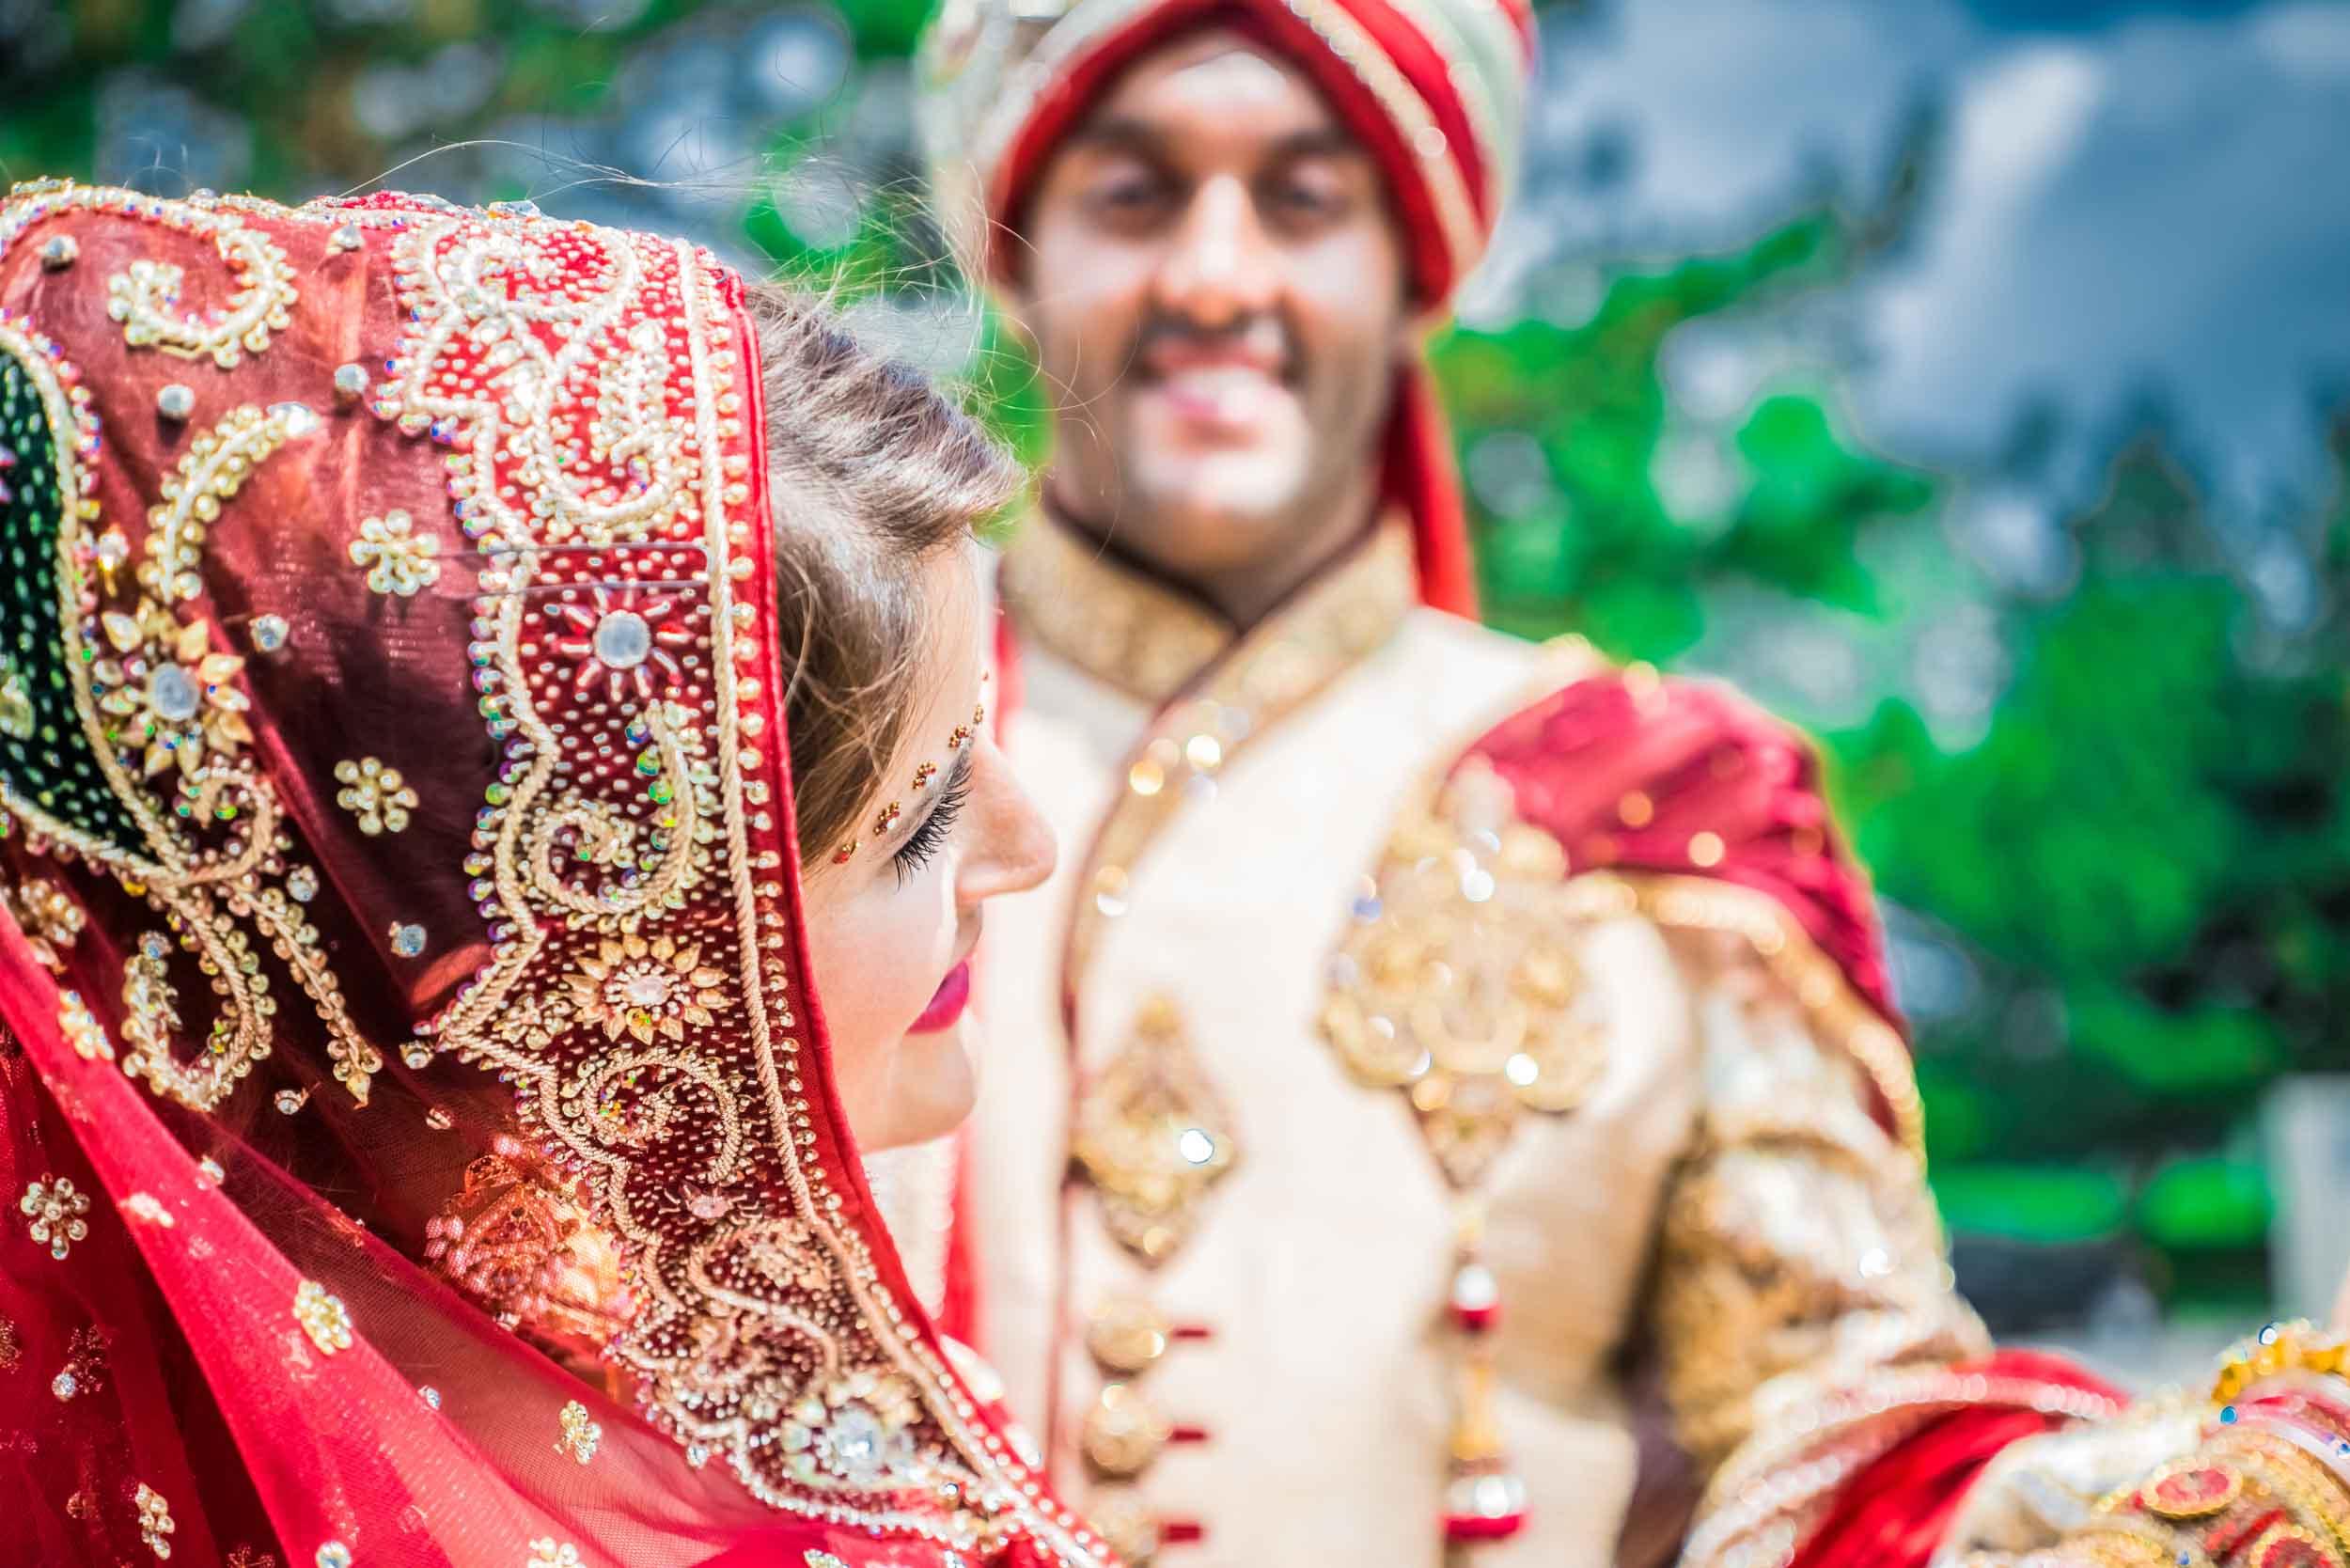 dc+metro+wedding+photographer+vadym+guliuk+photography+wedding+bride+and+groom-2042.jpg